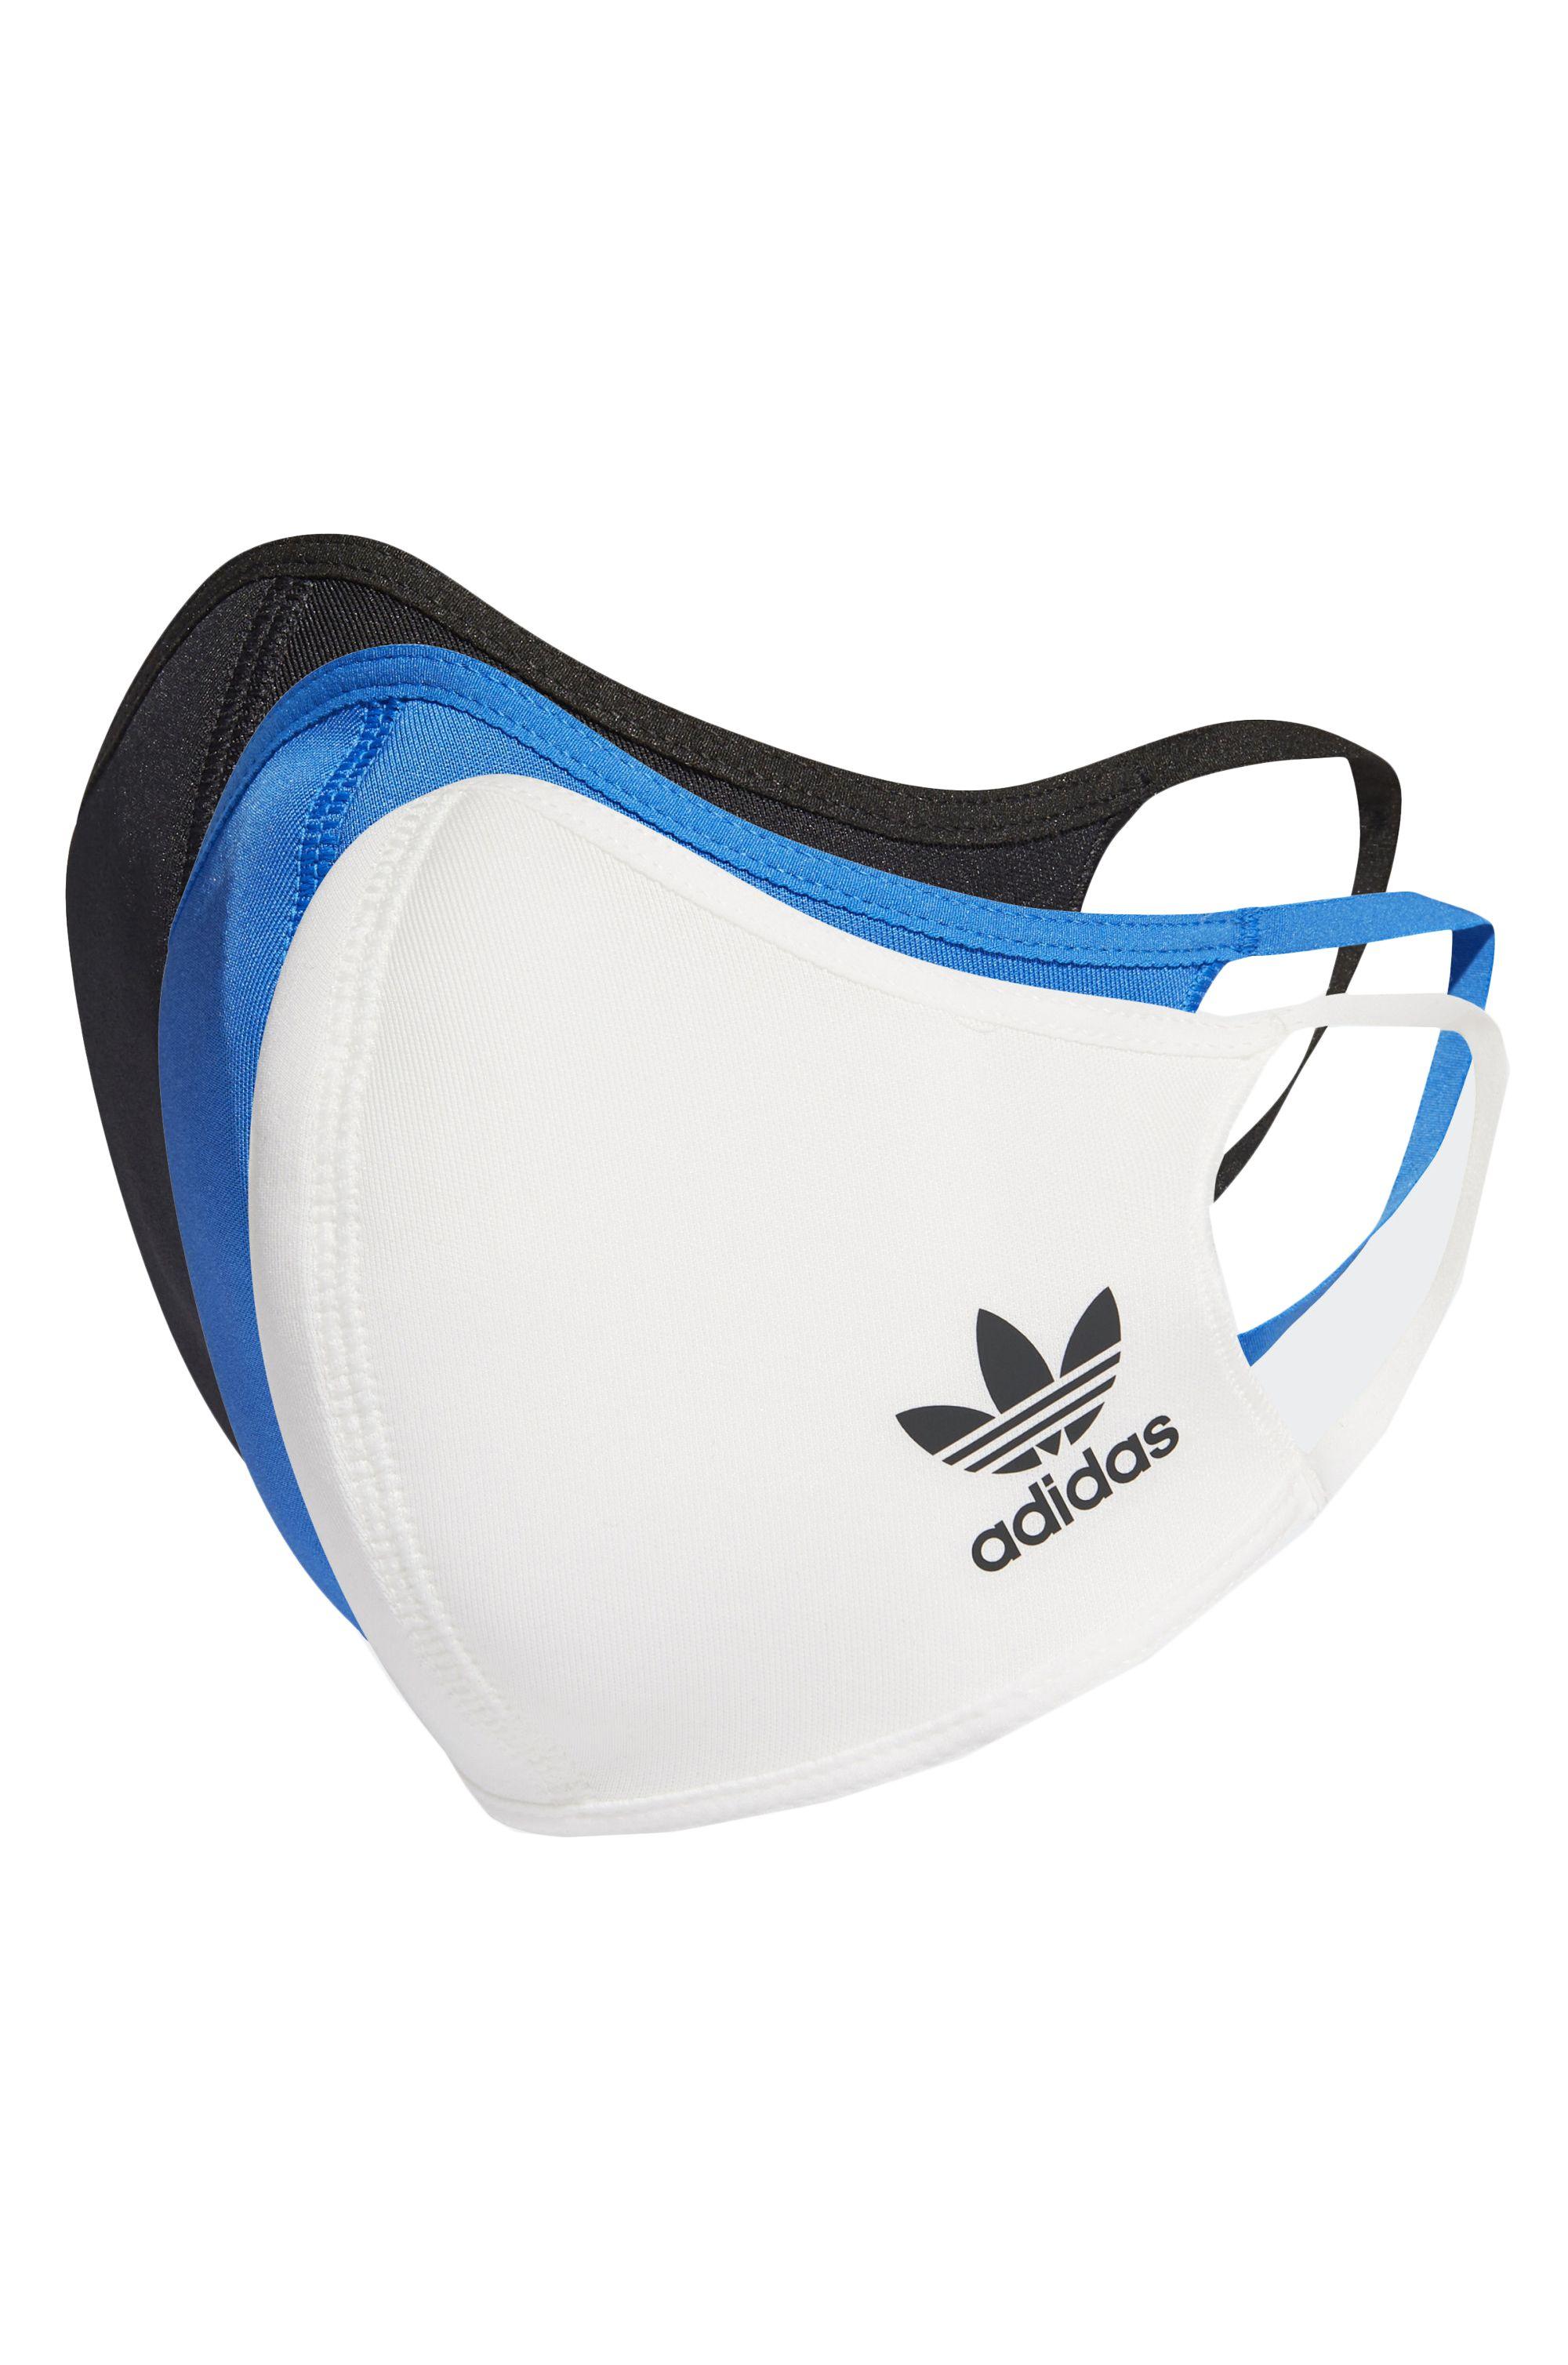 DV Adidas Máscara BOS SMALL MULTI 3PK Black/Blue/White